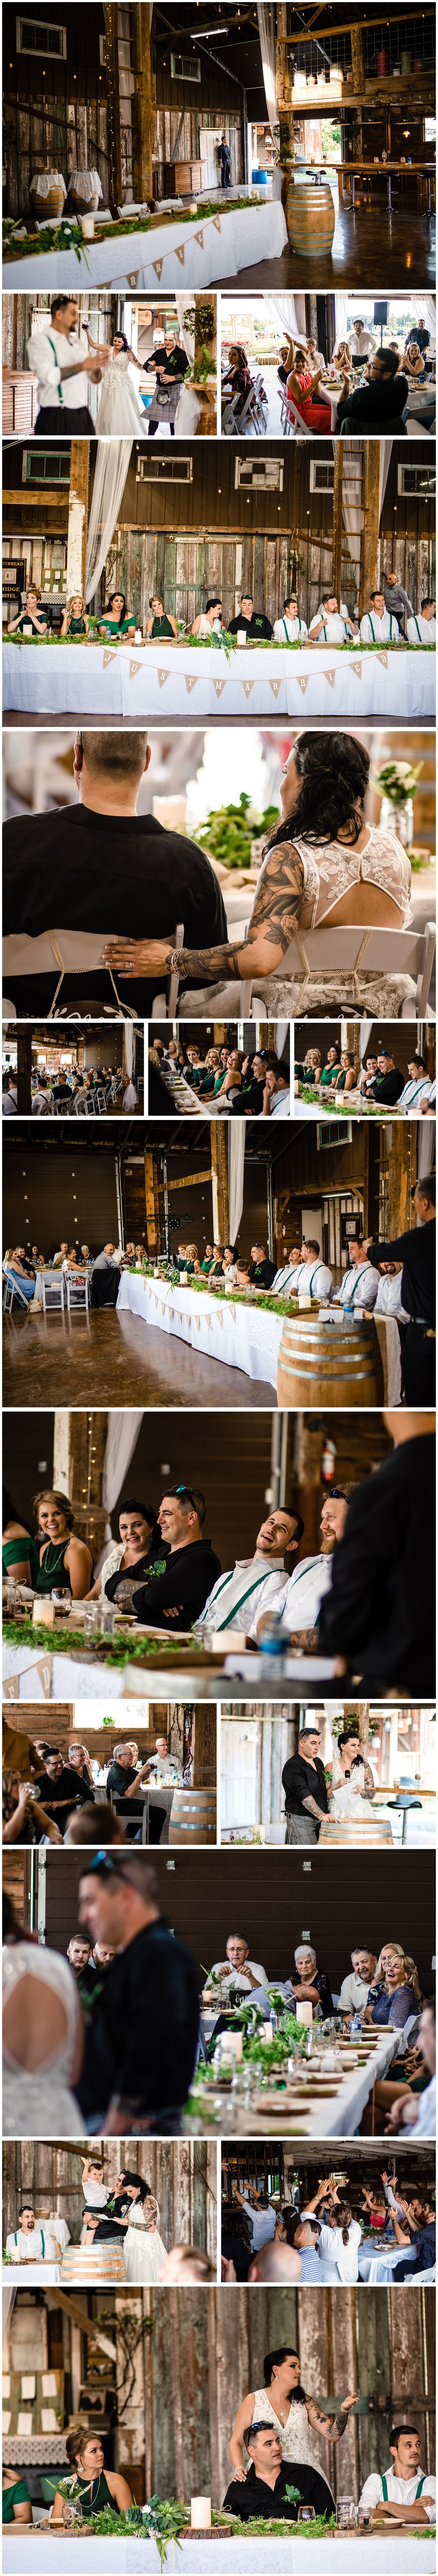 White-Owl-Barn-langley-bc-wedding-photographer-rustic-bbq-foodtruck-scottish-emerald-green-drinks_0007.jpg